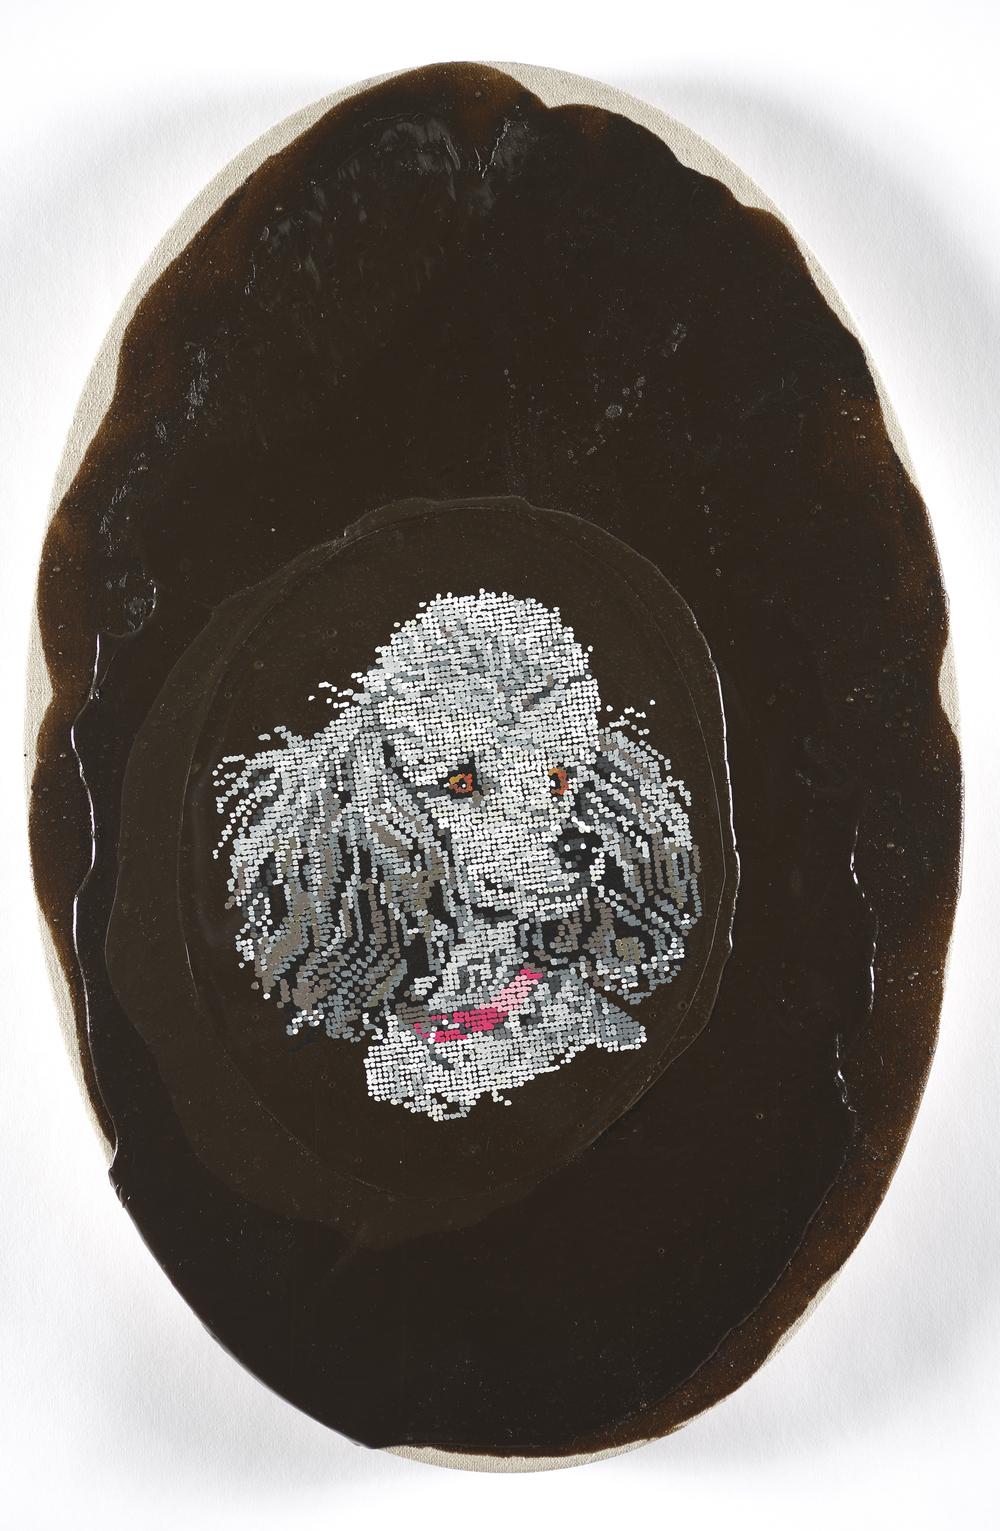 Kirstin Lamb Poodle Drama 2015 Gouache on Duralar with Acrylic on Linen 10 x 20 in oval.jpeg